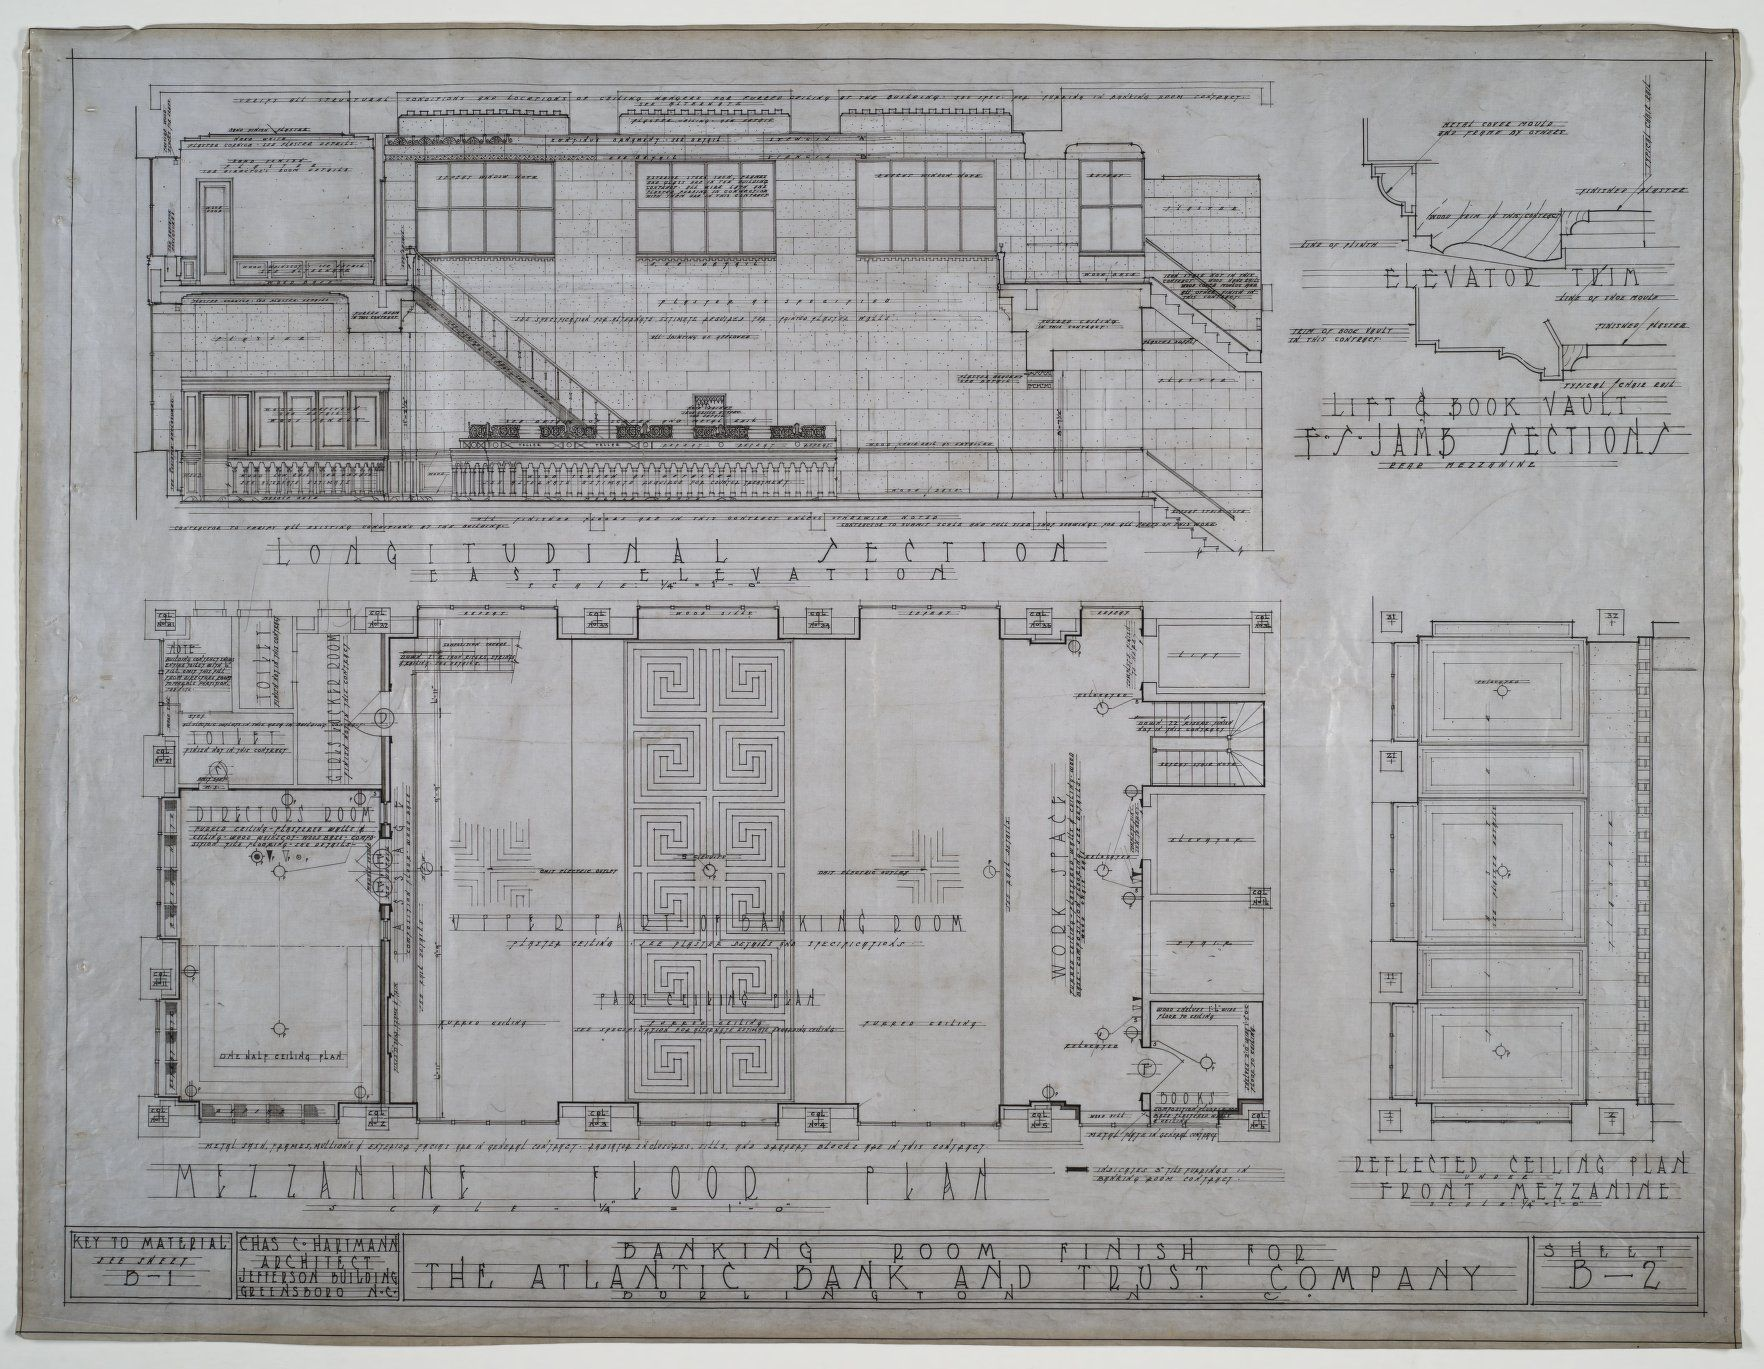 Mezzanine Floor Plan Elevation And Ceiling Mezzanine Floor Mezzanine Floor Plans